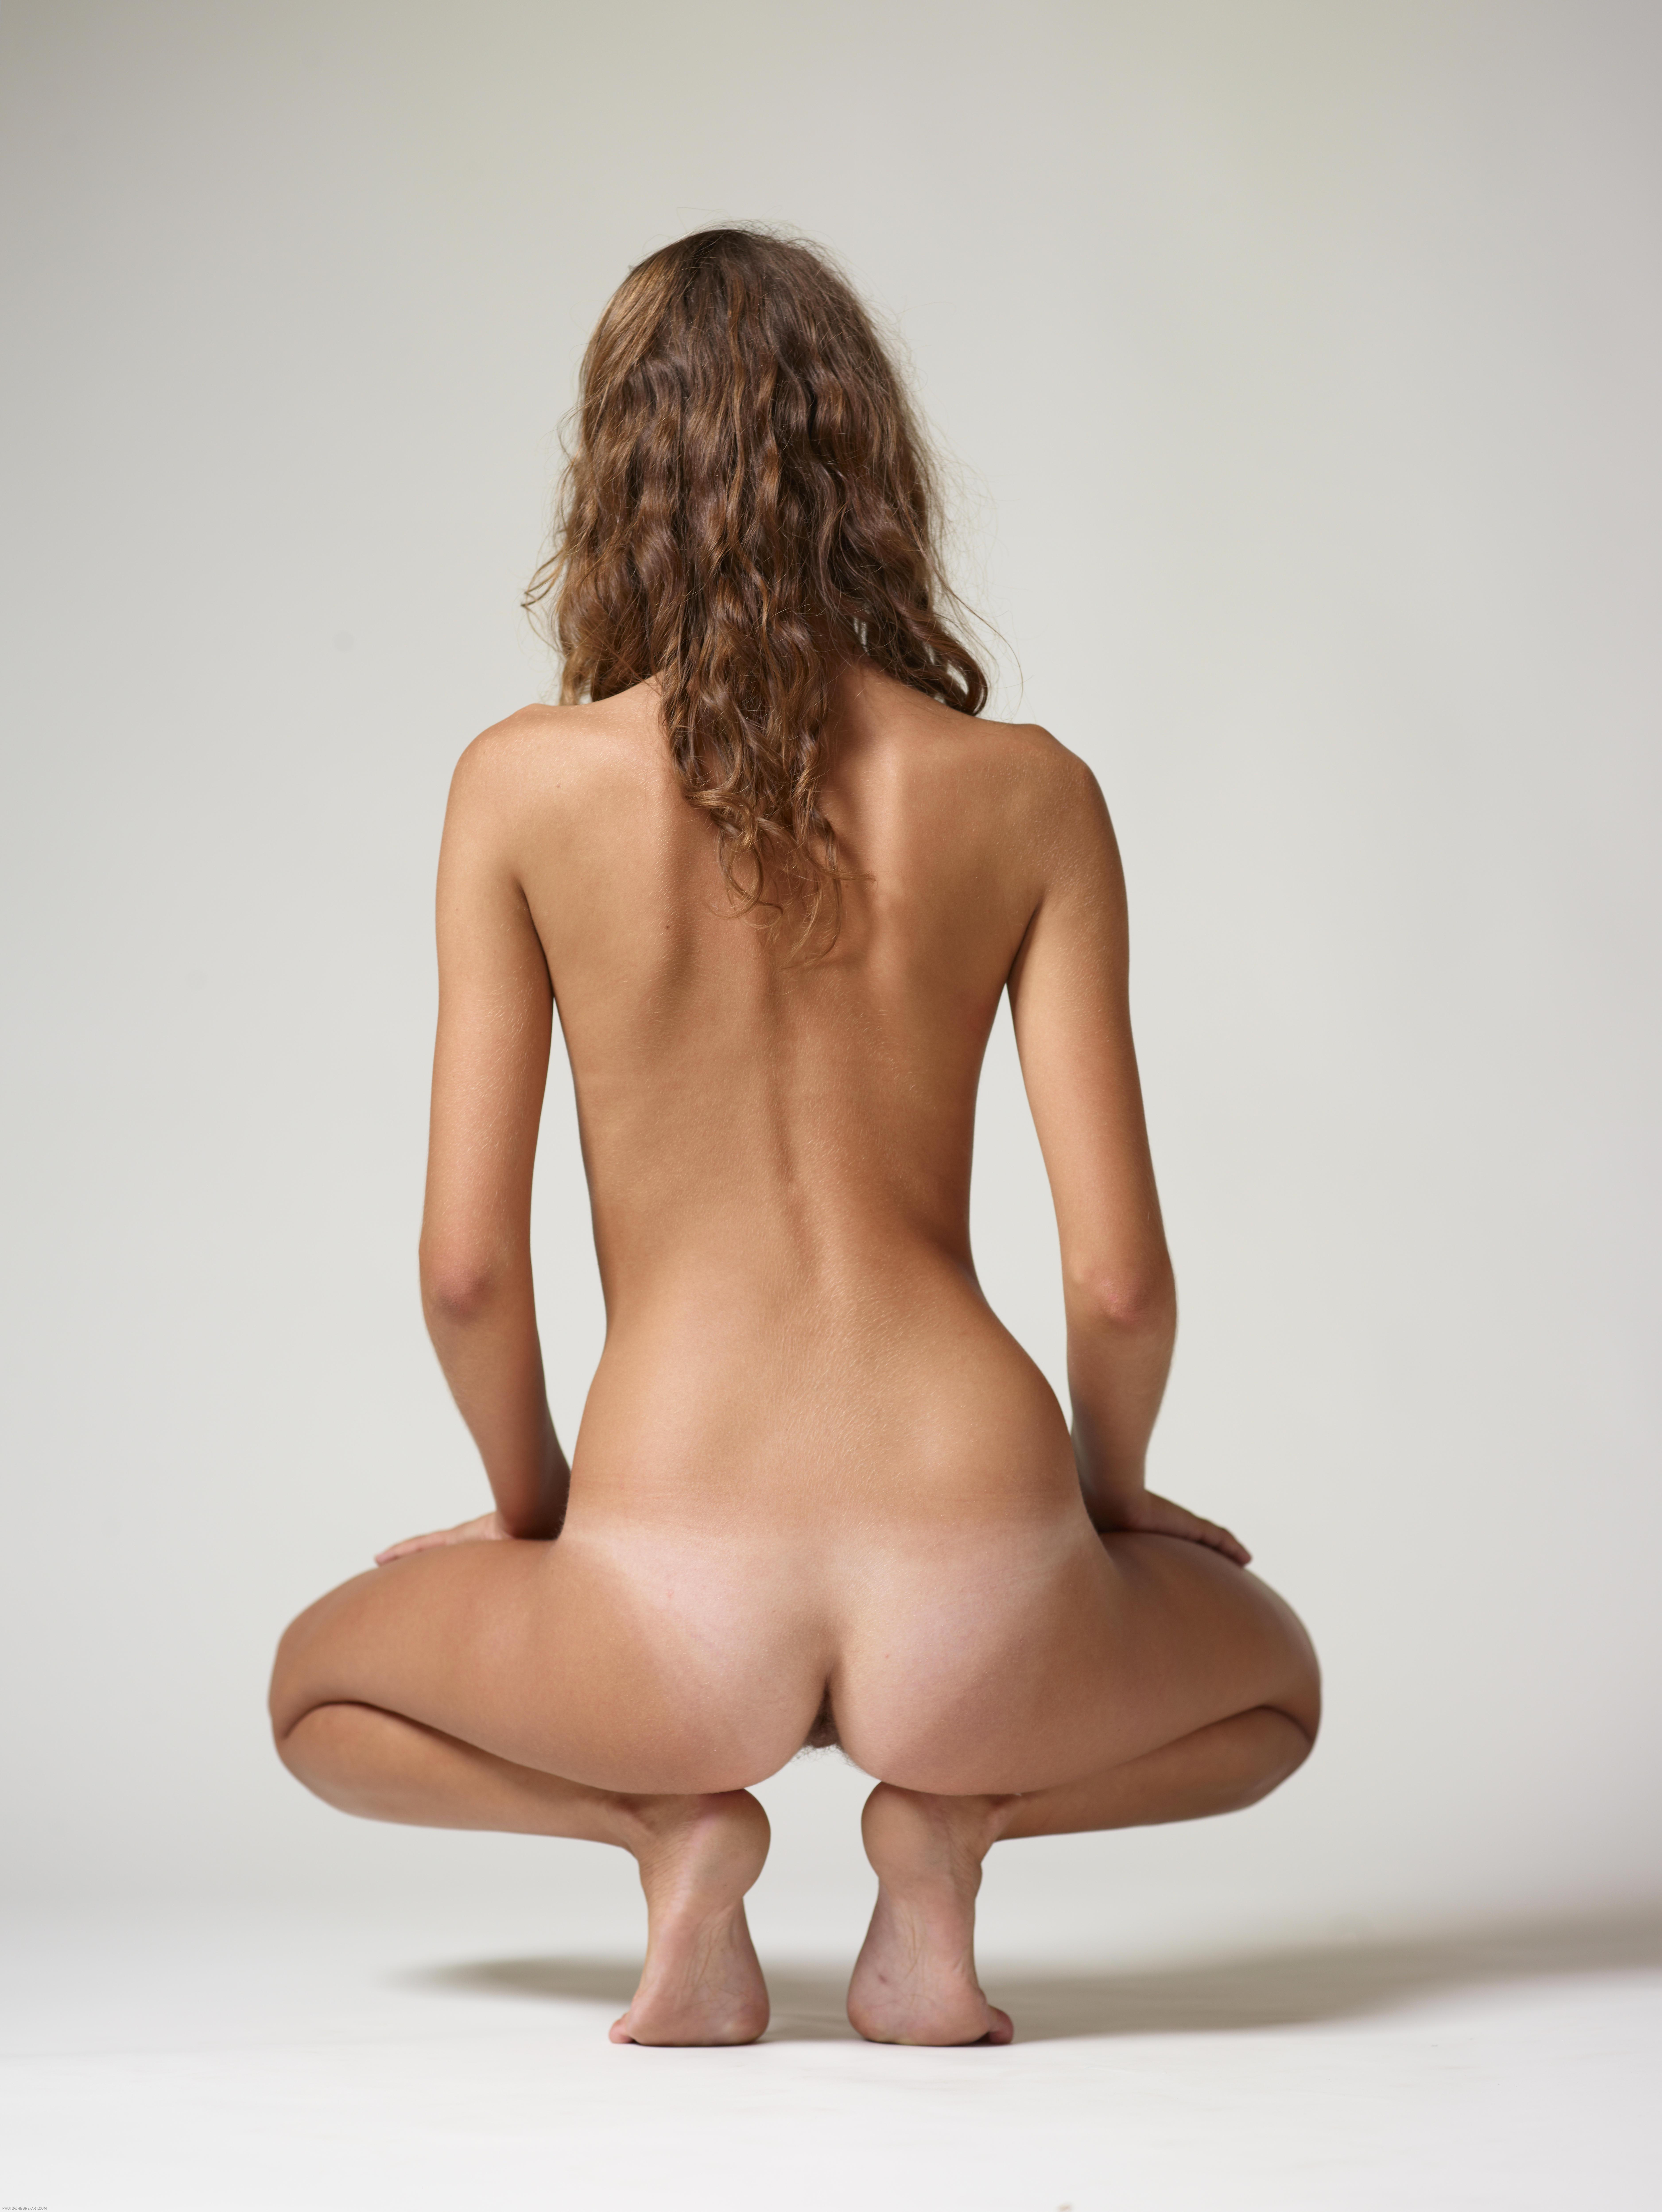 Us womens polo team nude